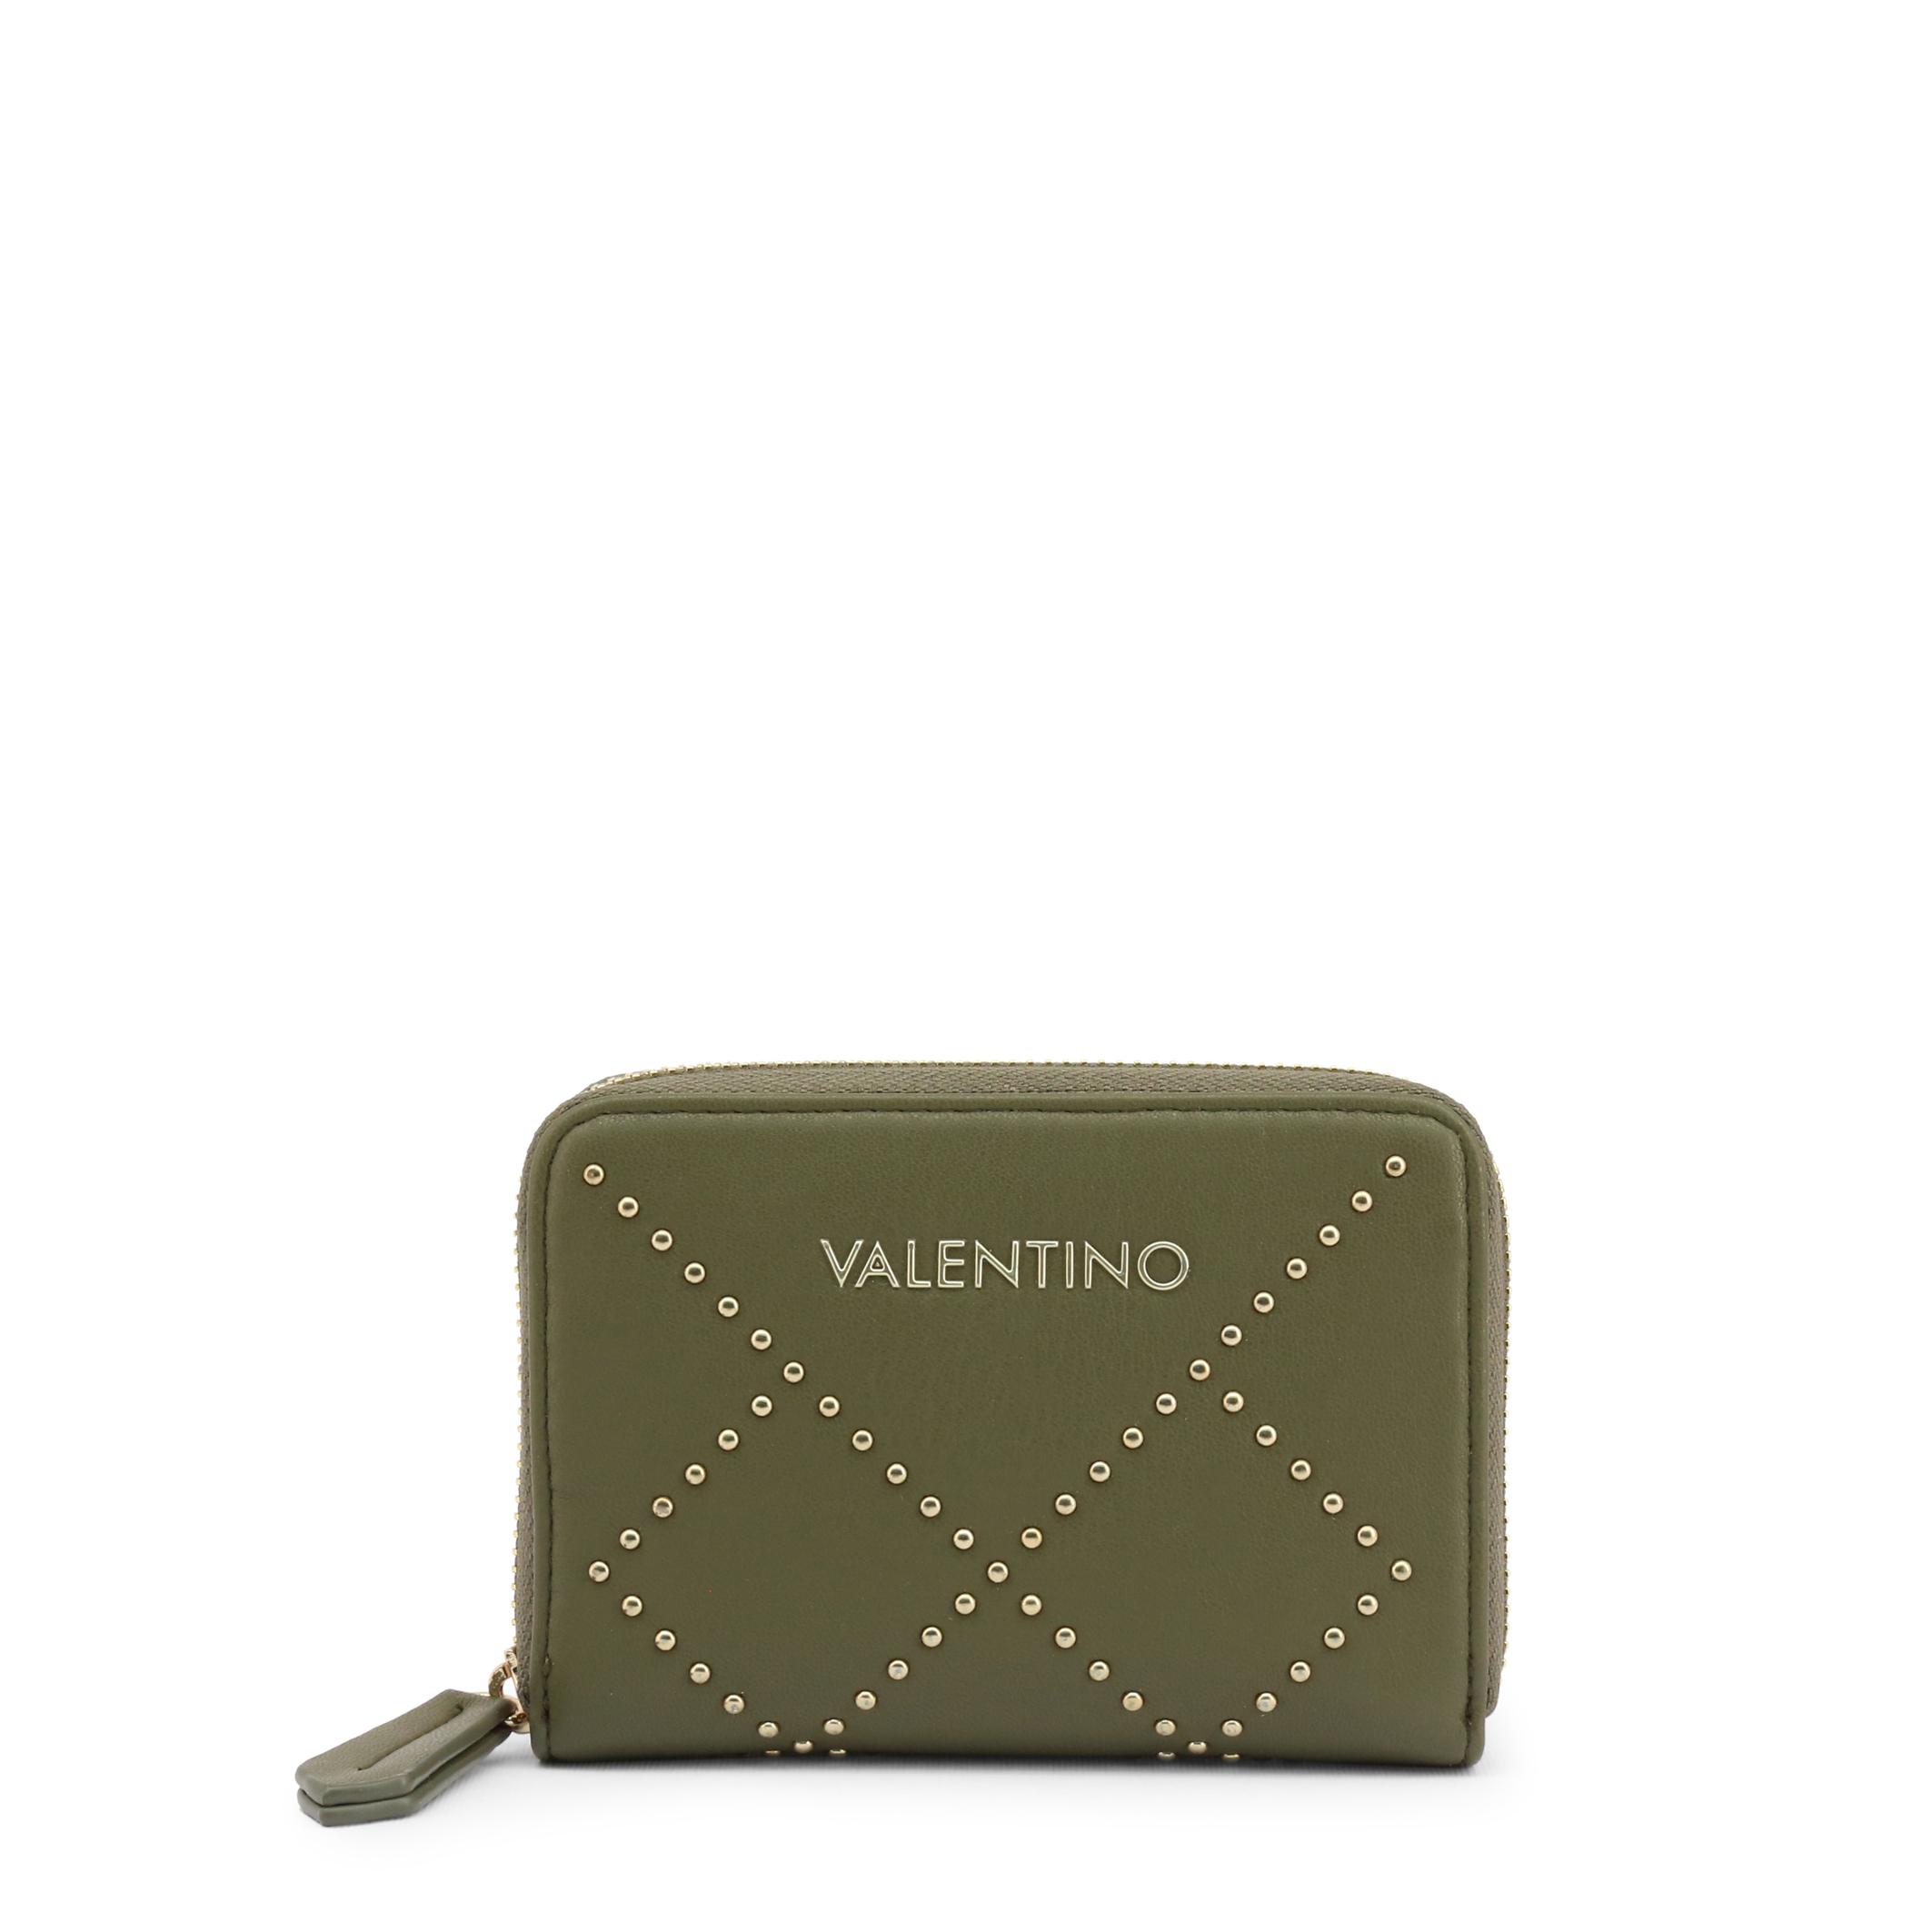 Valentino by Mario Valentino MANDOLINO-VPS3KI137